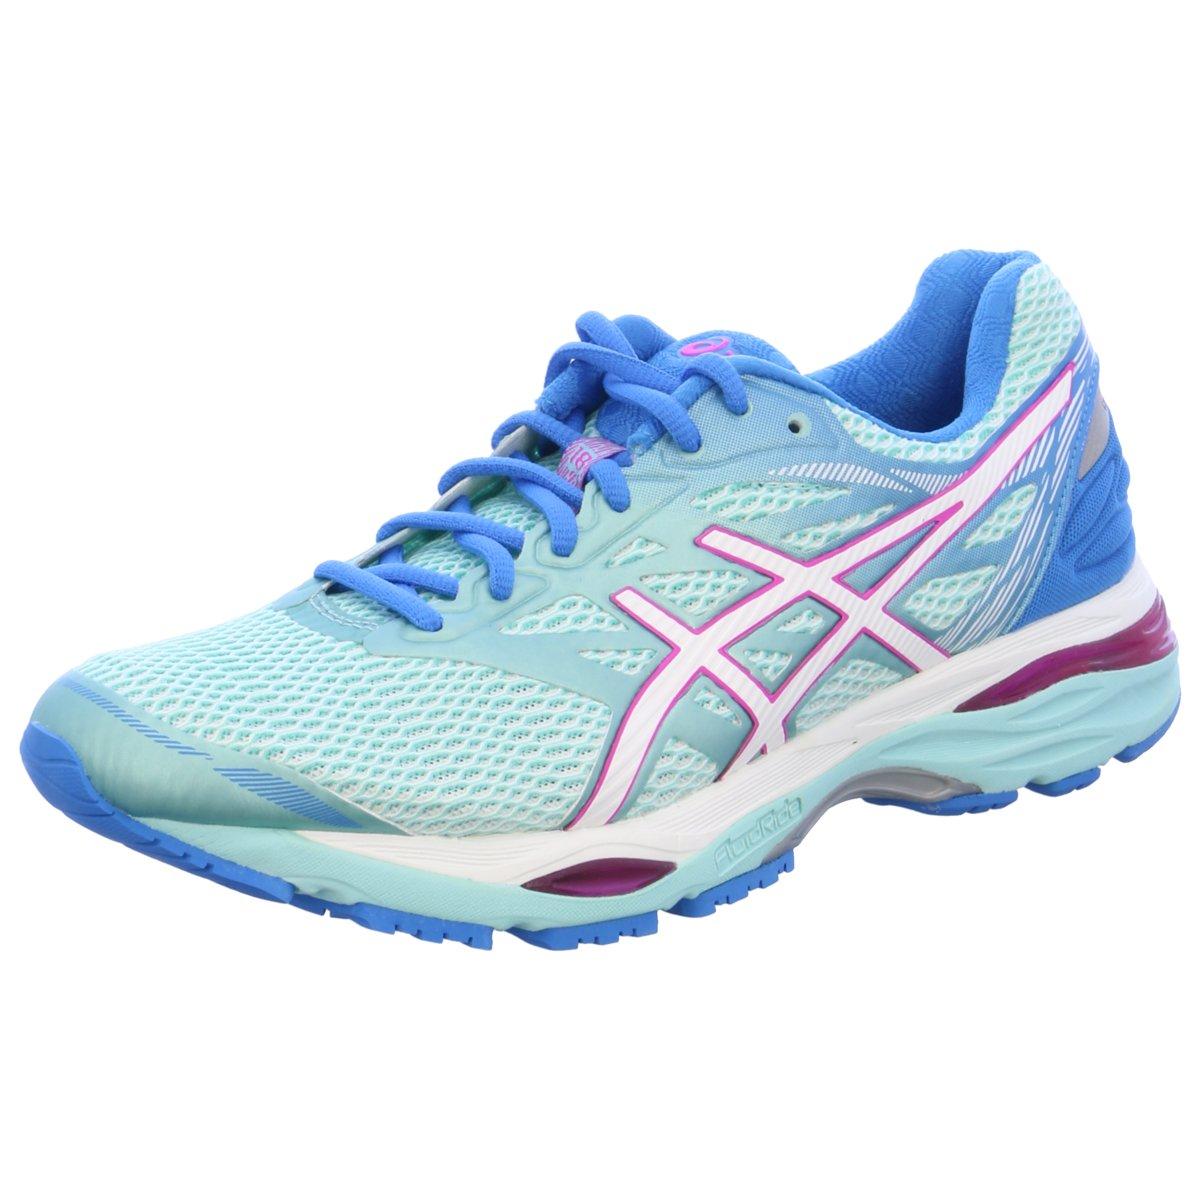 Details zu #S2K asics Damen Sportschuhe Gel Cumulus 18 Damen Laufschuhe Running blau mint